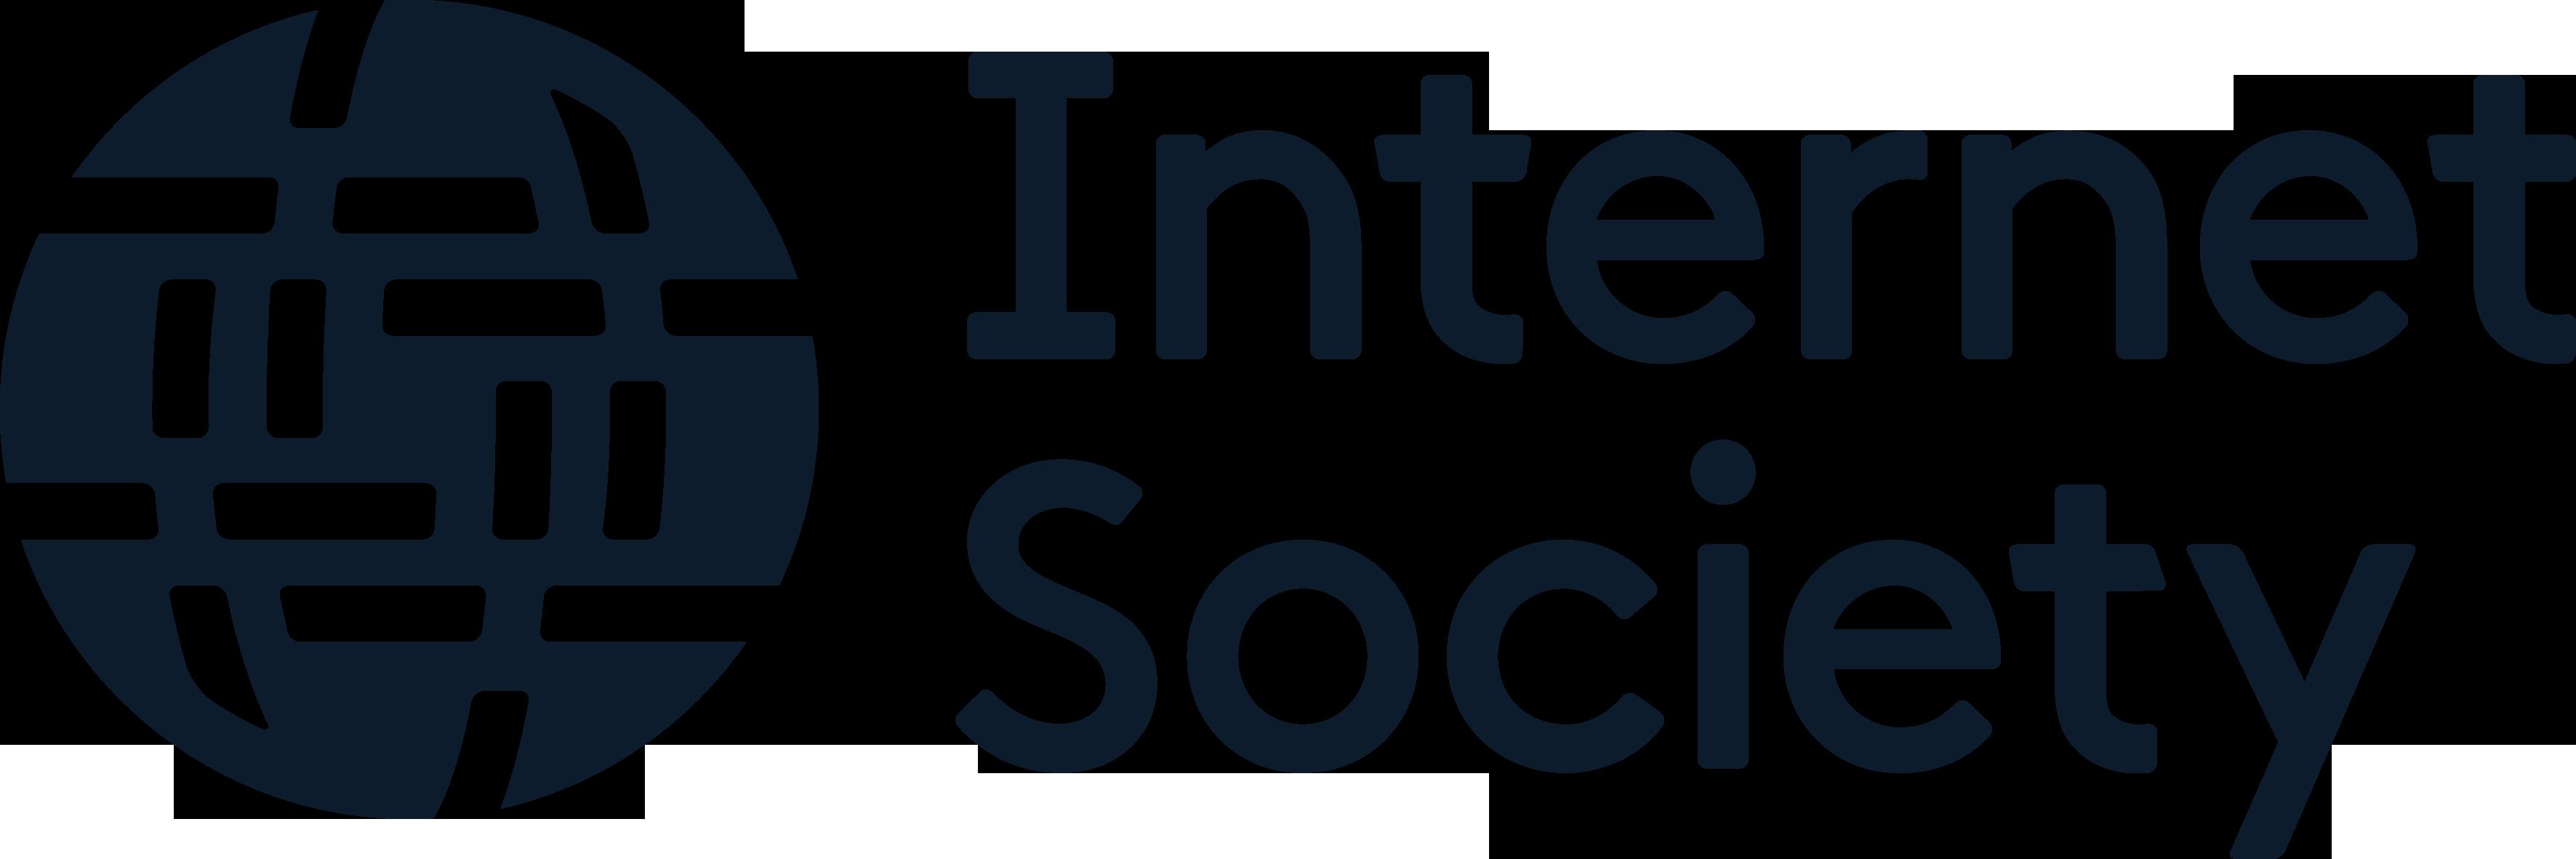 ISOC-Dark-RGB_Logo_2016-08-01_EN_FINAL_v01